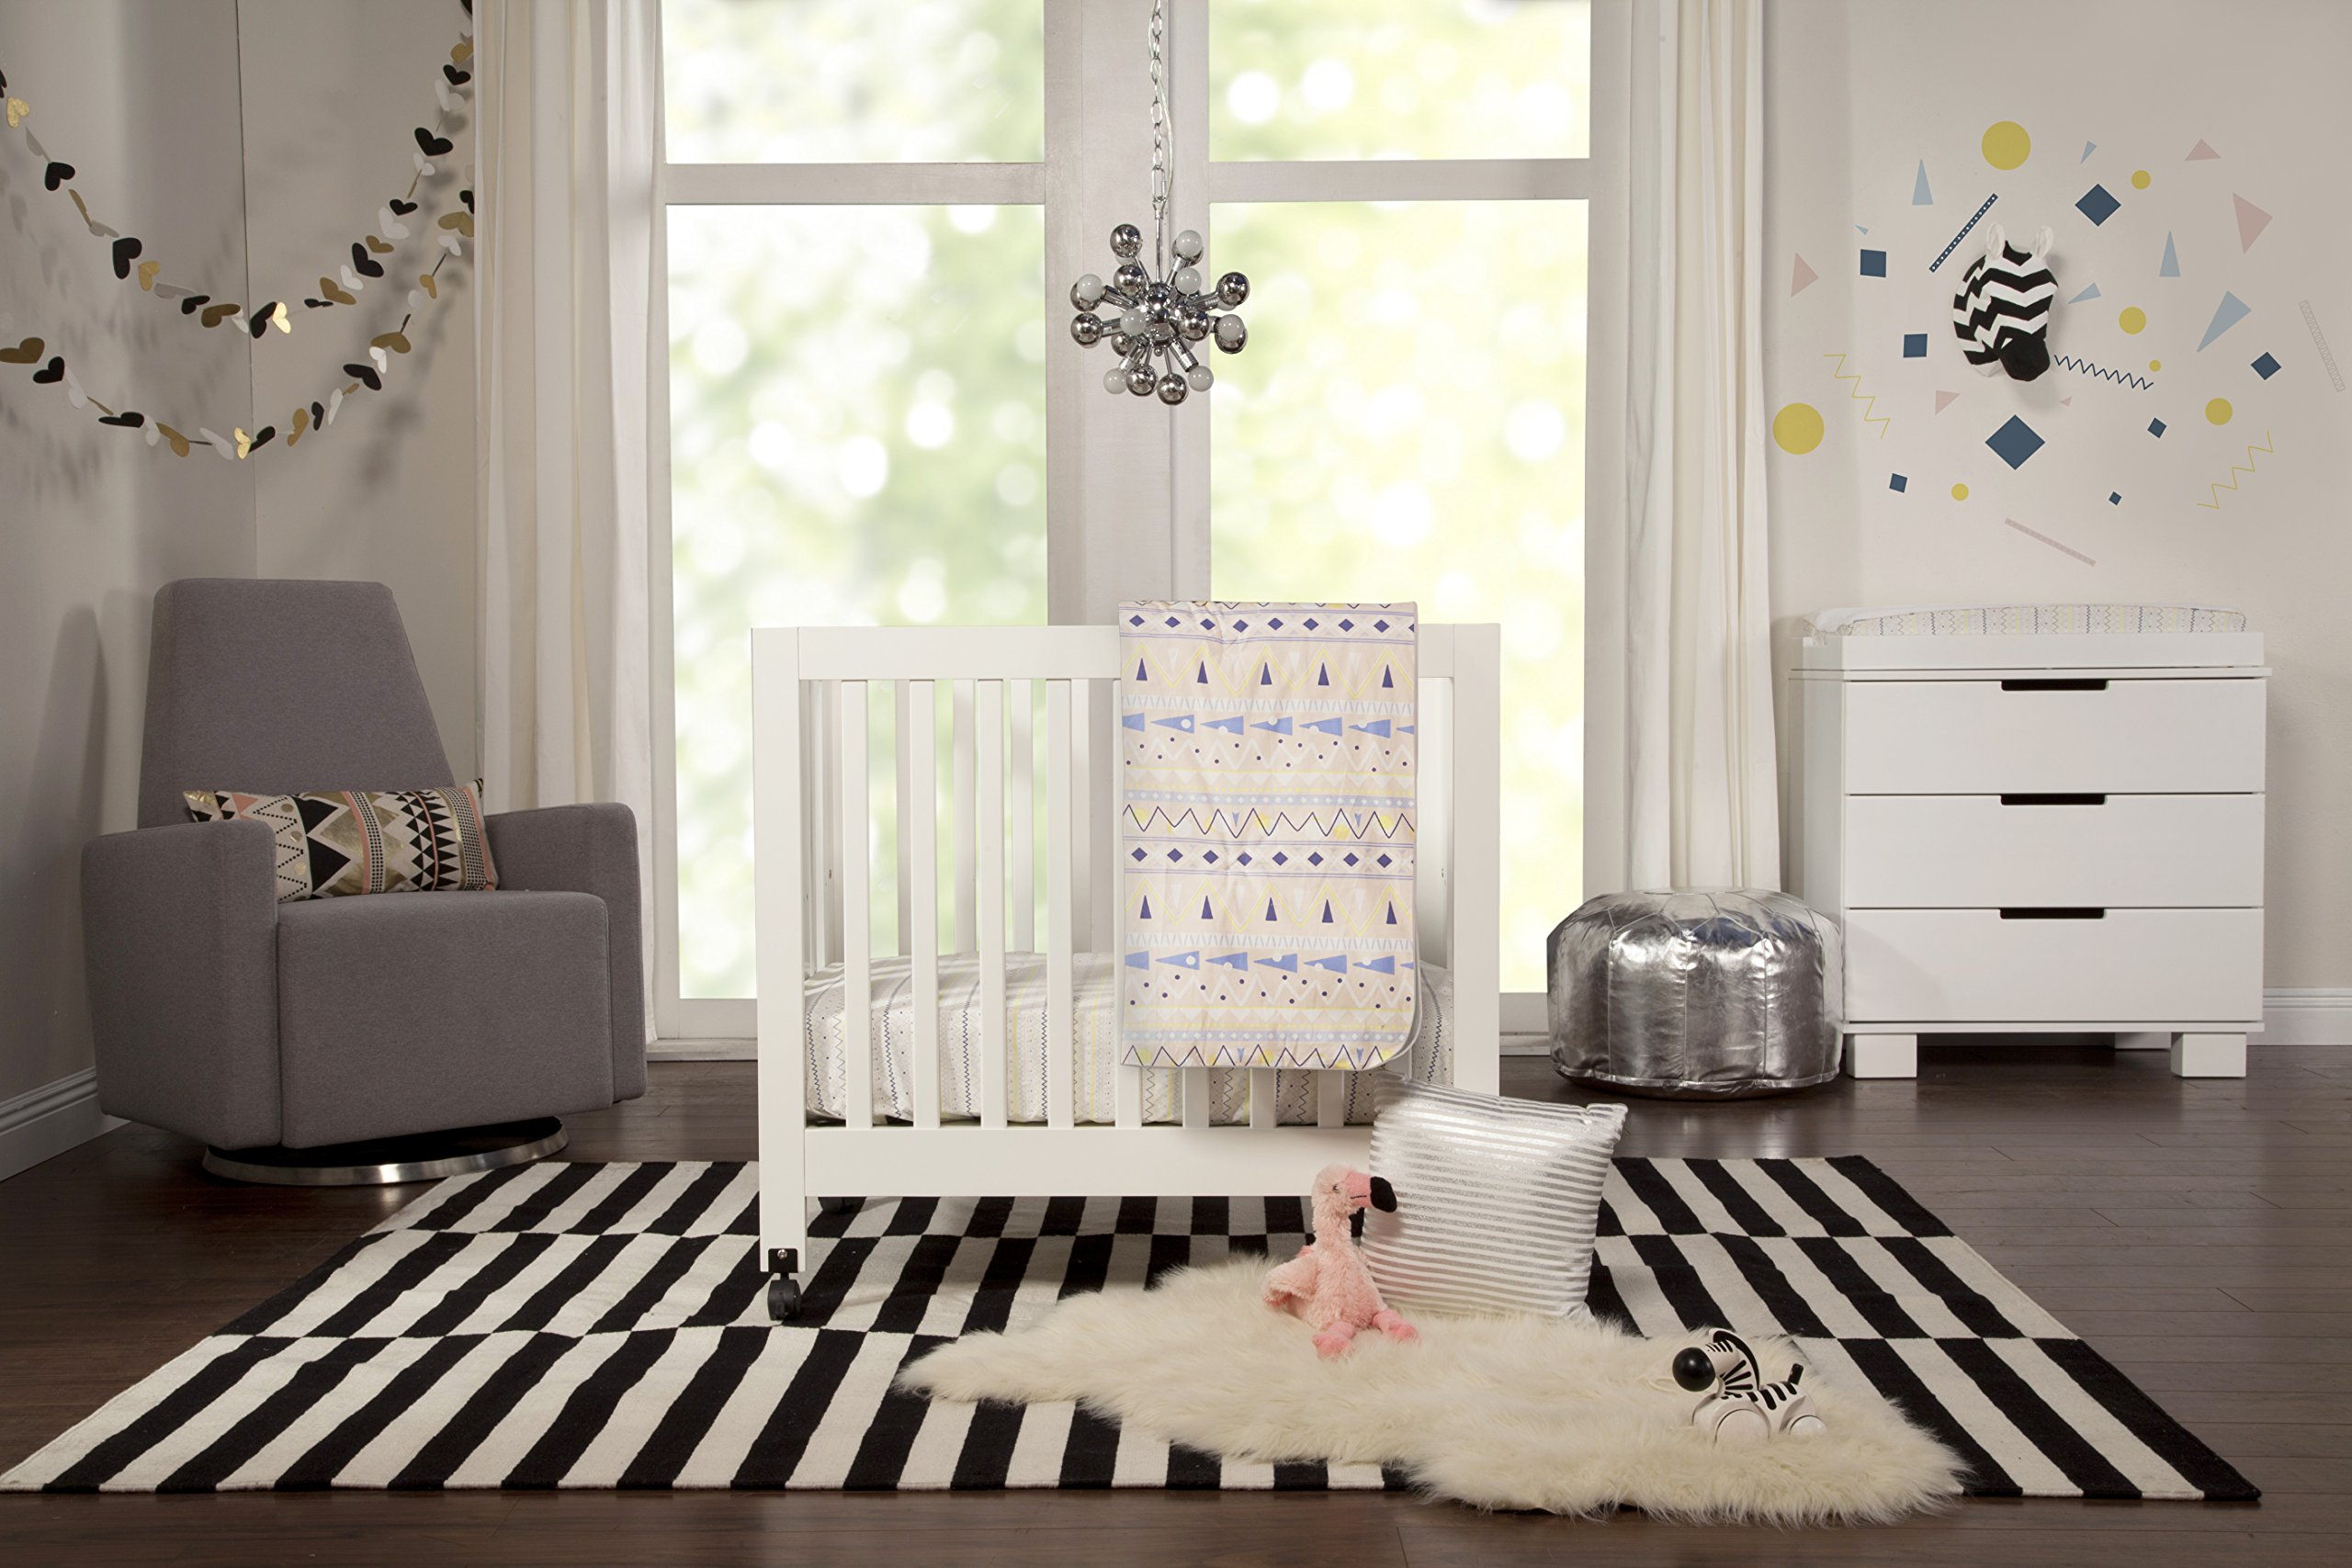 of cradle crib design standard origami sede commonplace mini revista image ideas vs